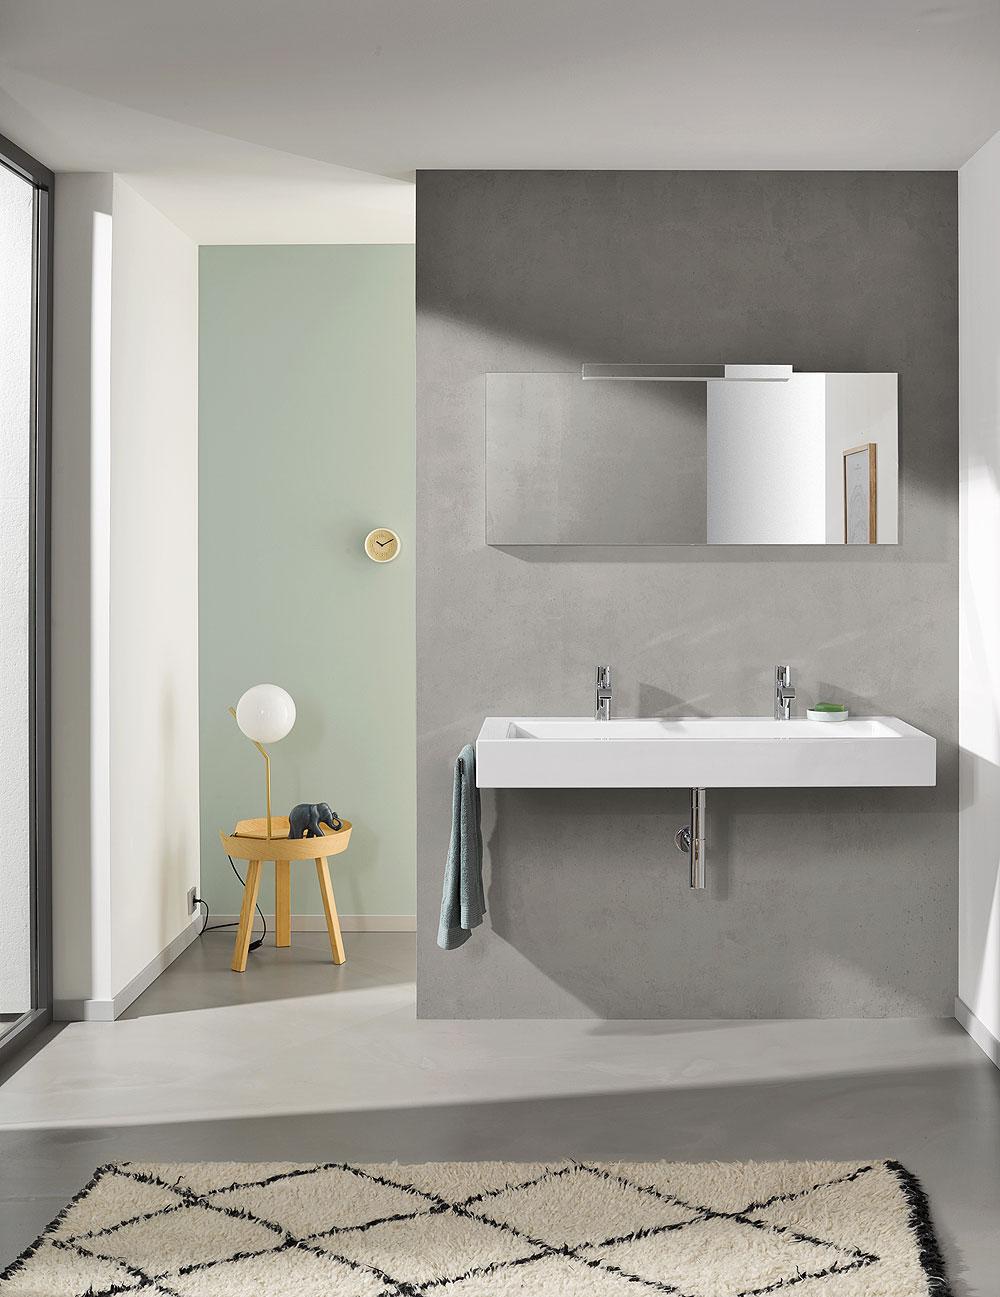 lavamanos-twice-sieger-design-alape (3)